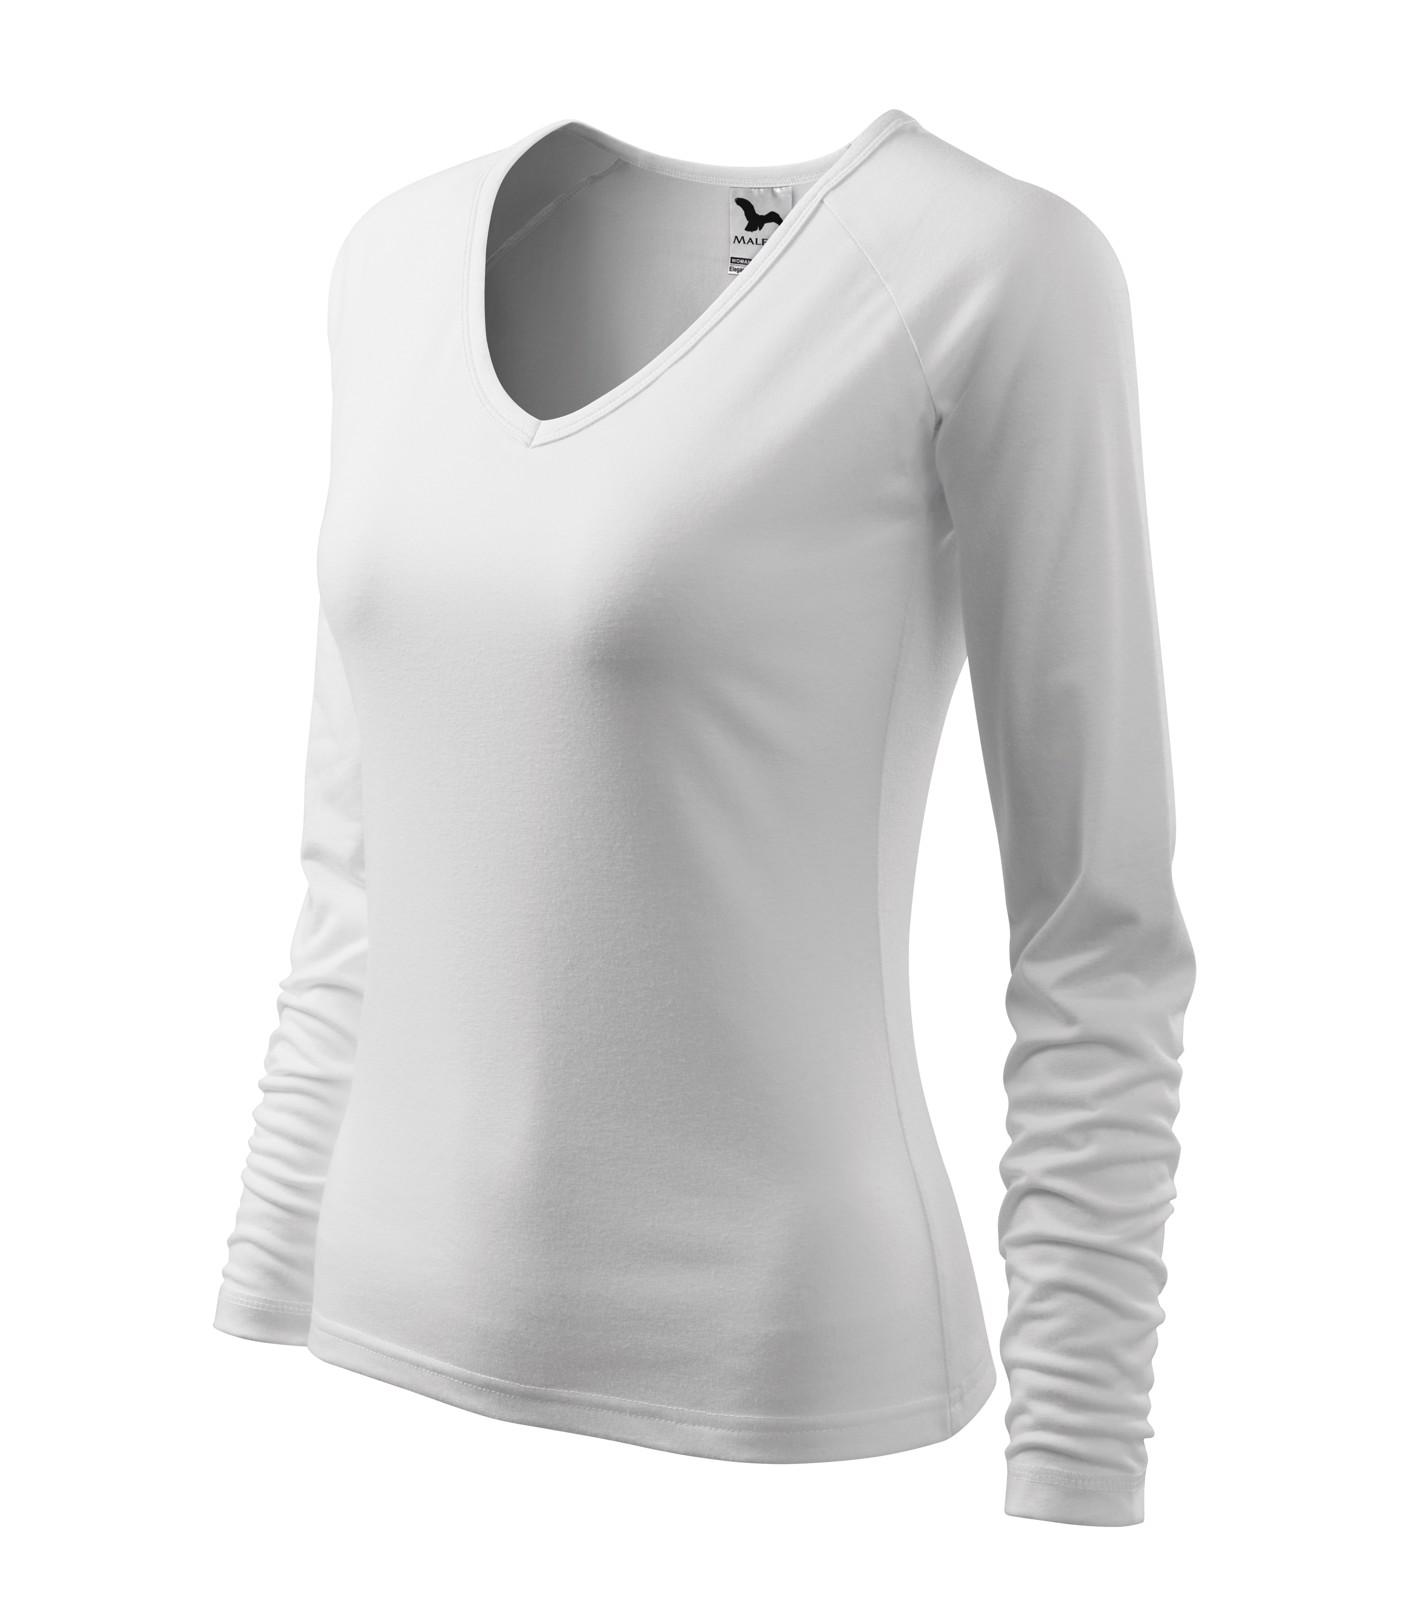 T-shirt women's Malfini Elegance - White / M